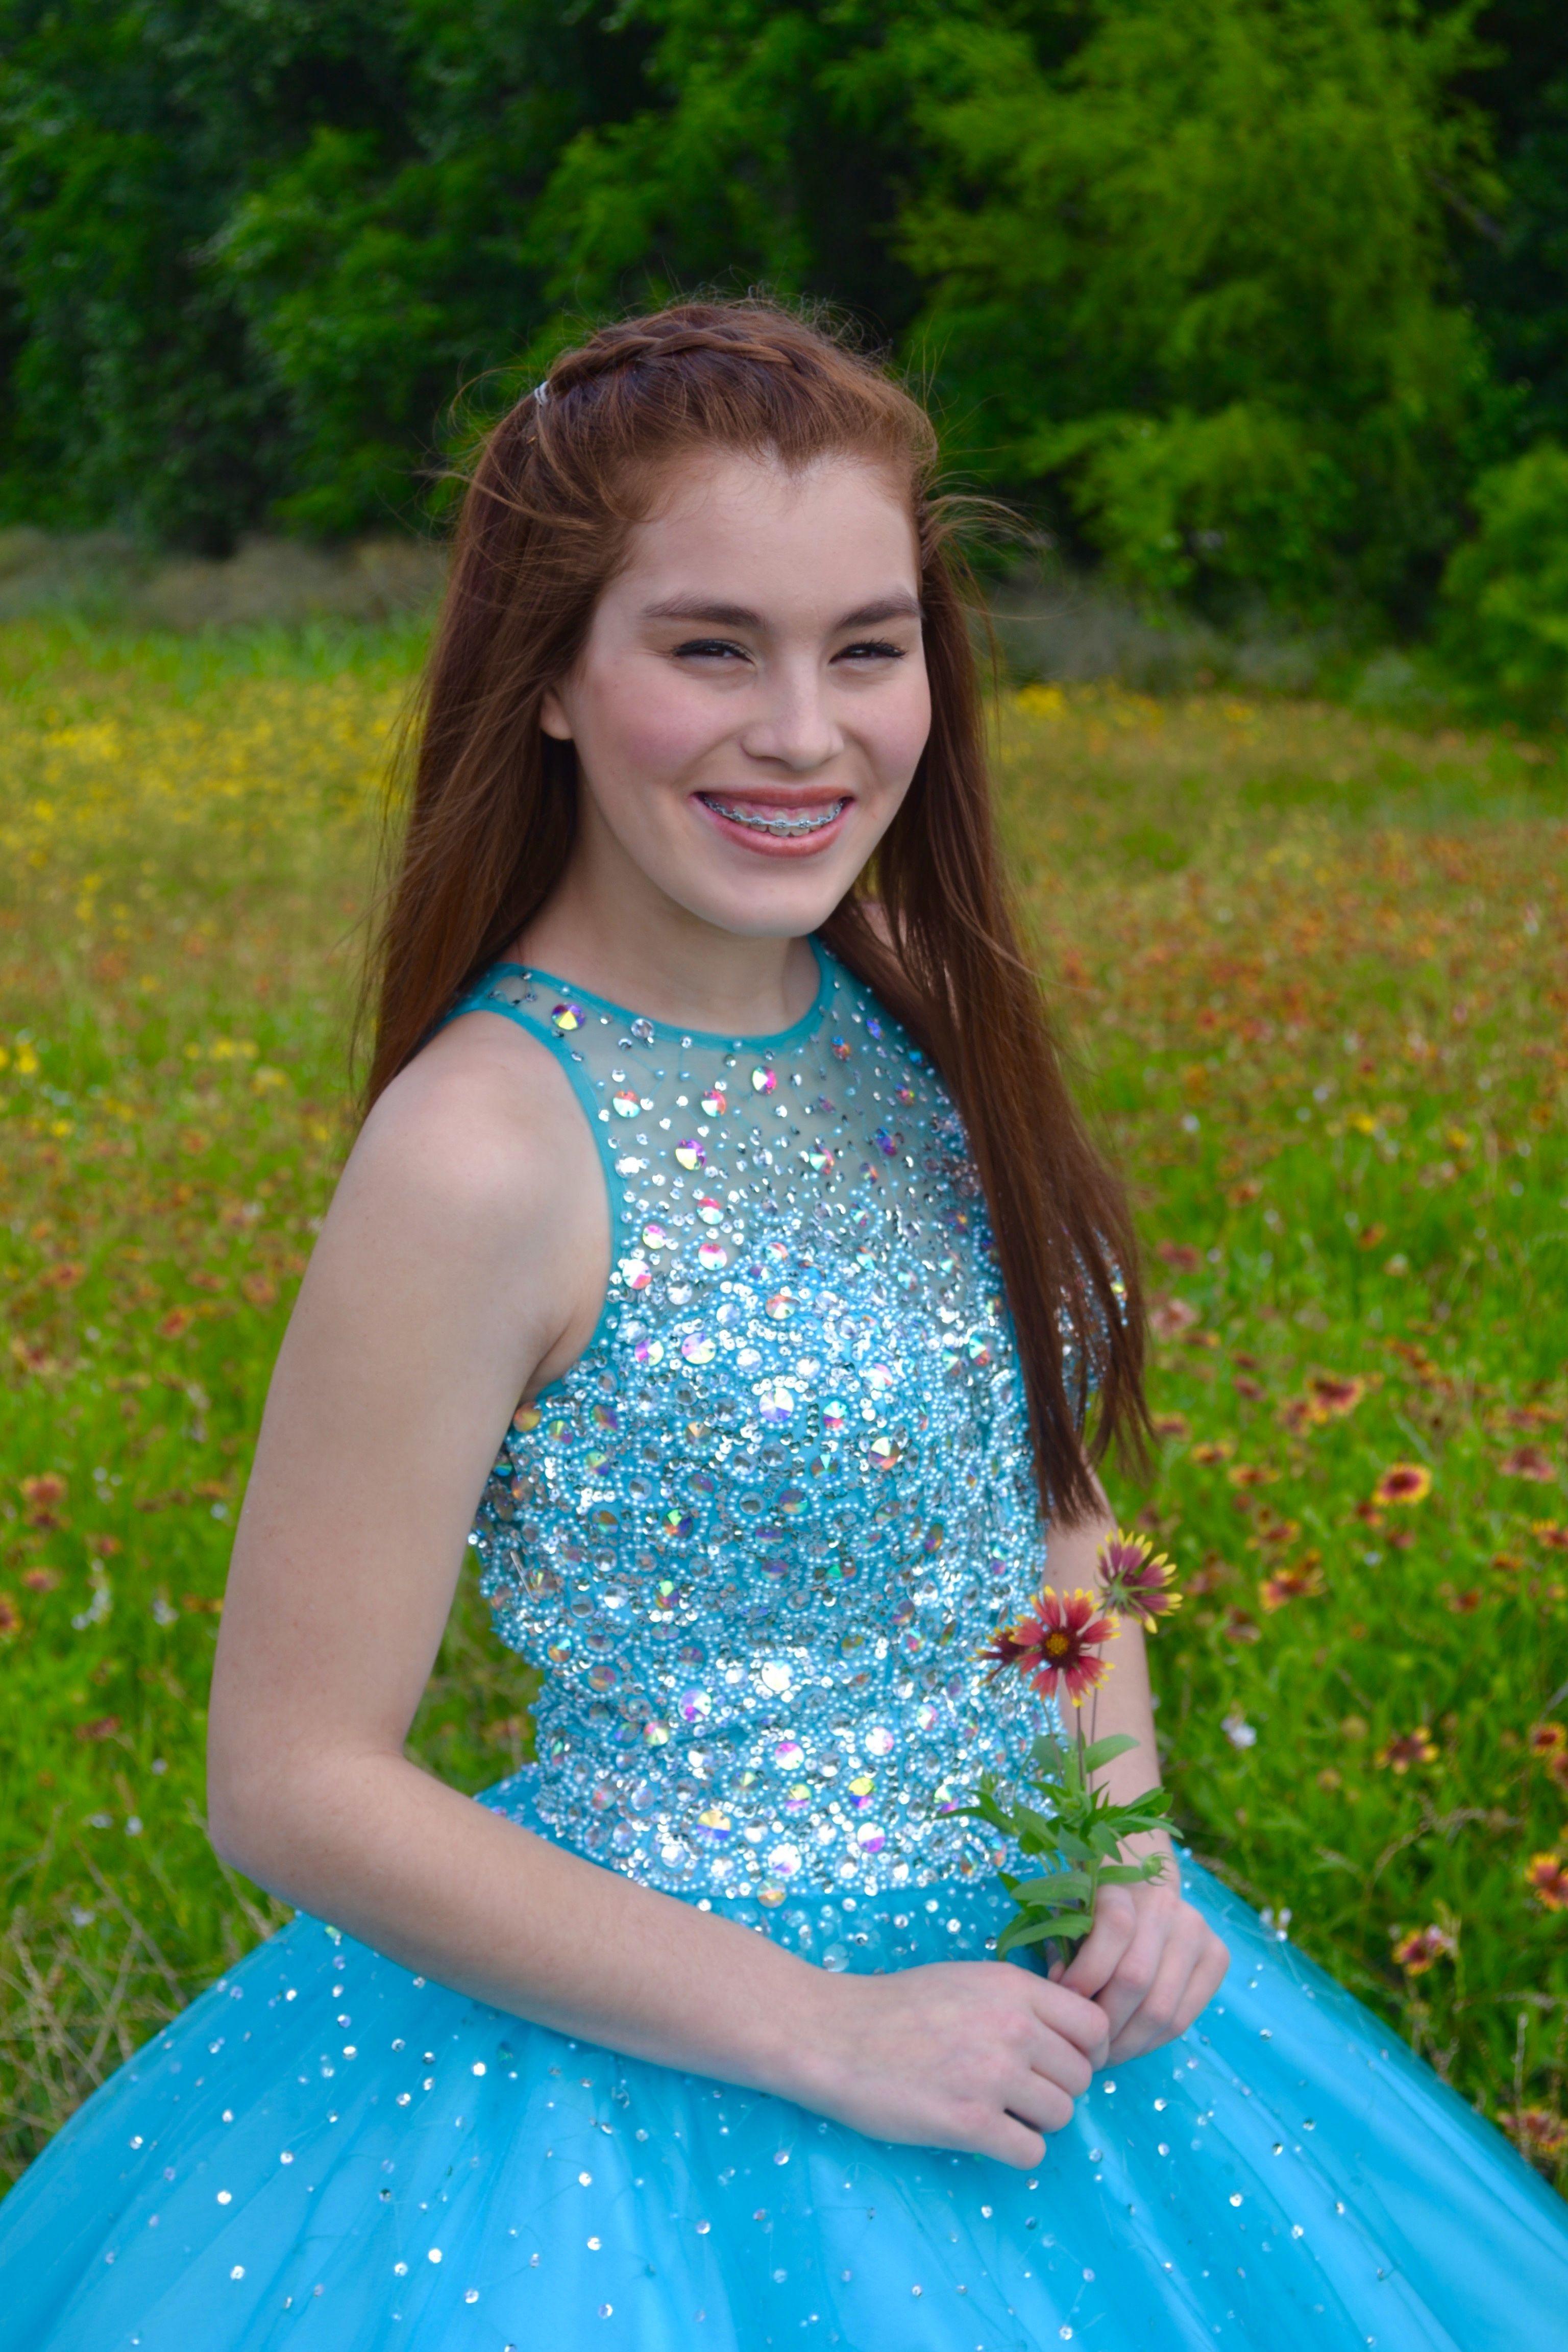 Please meet Isabella Rolon